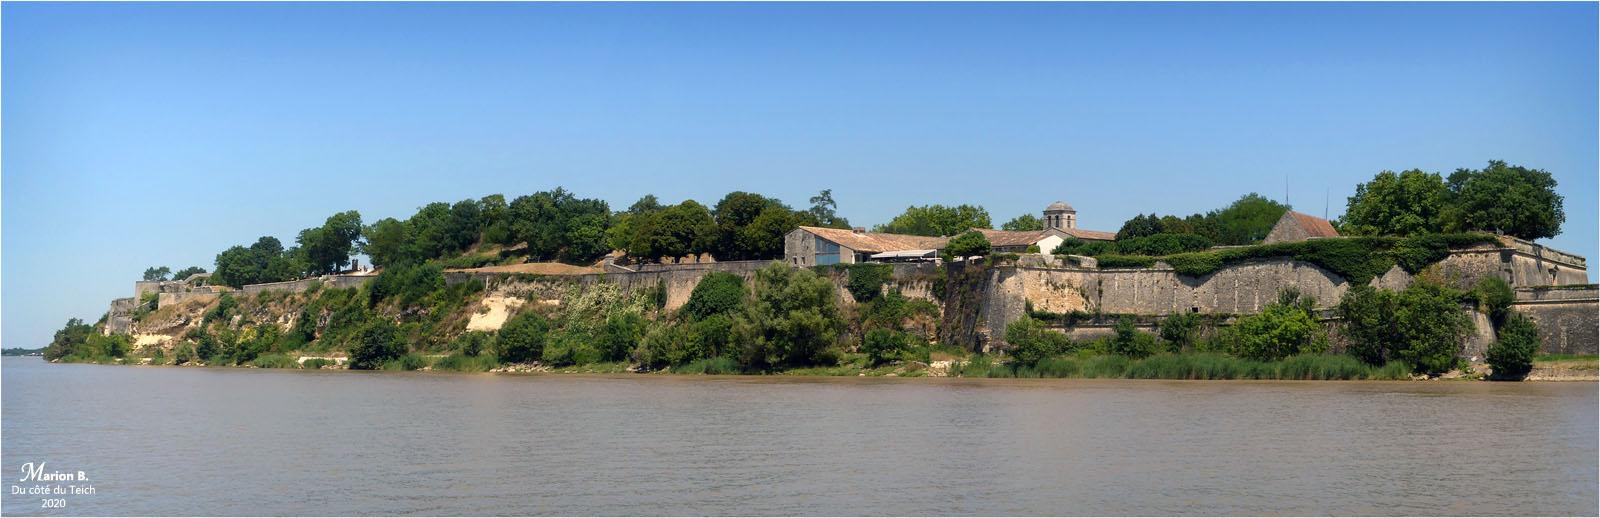 BLOG-P1040685-86-citadelle de Blaye